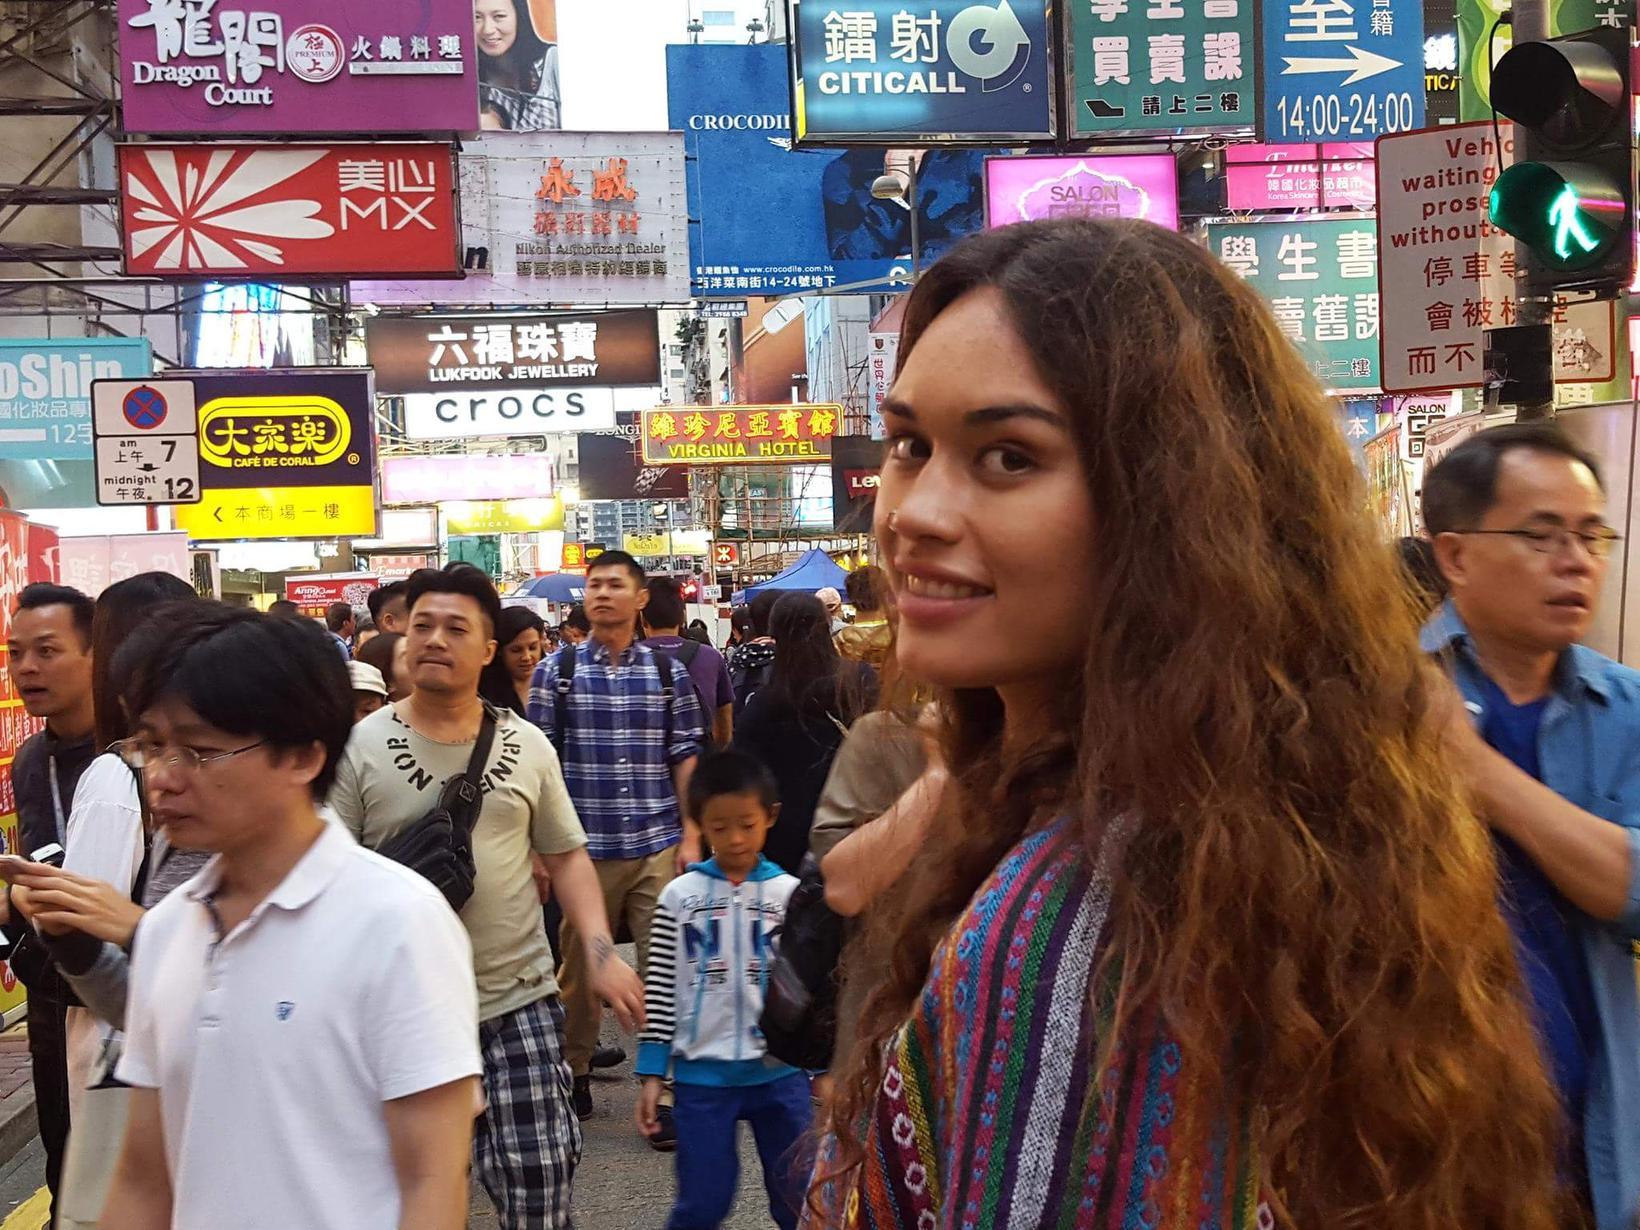 Larissa from Sydney, New South Wales, Australia